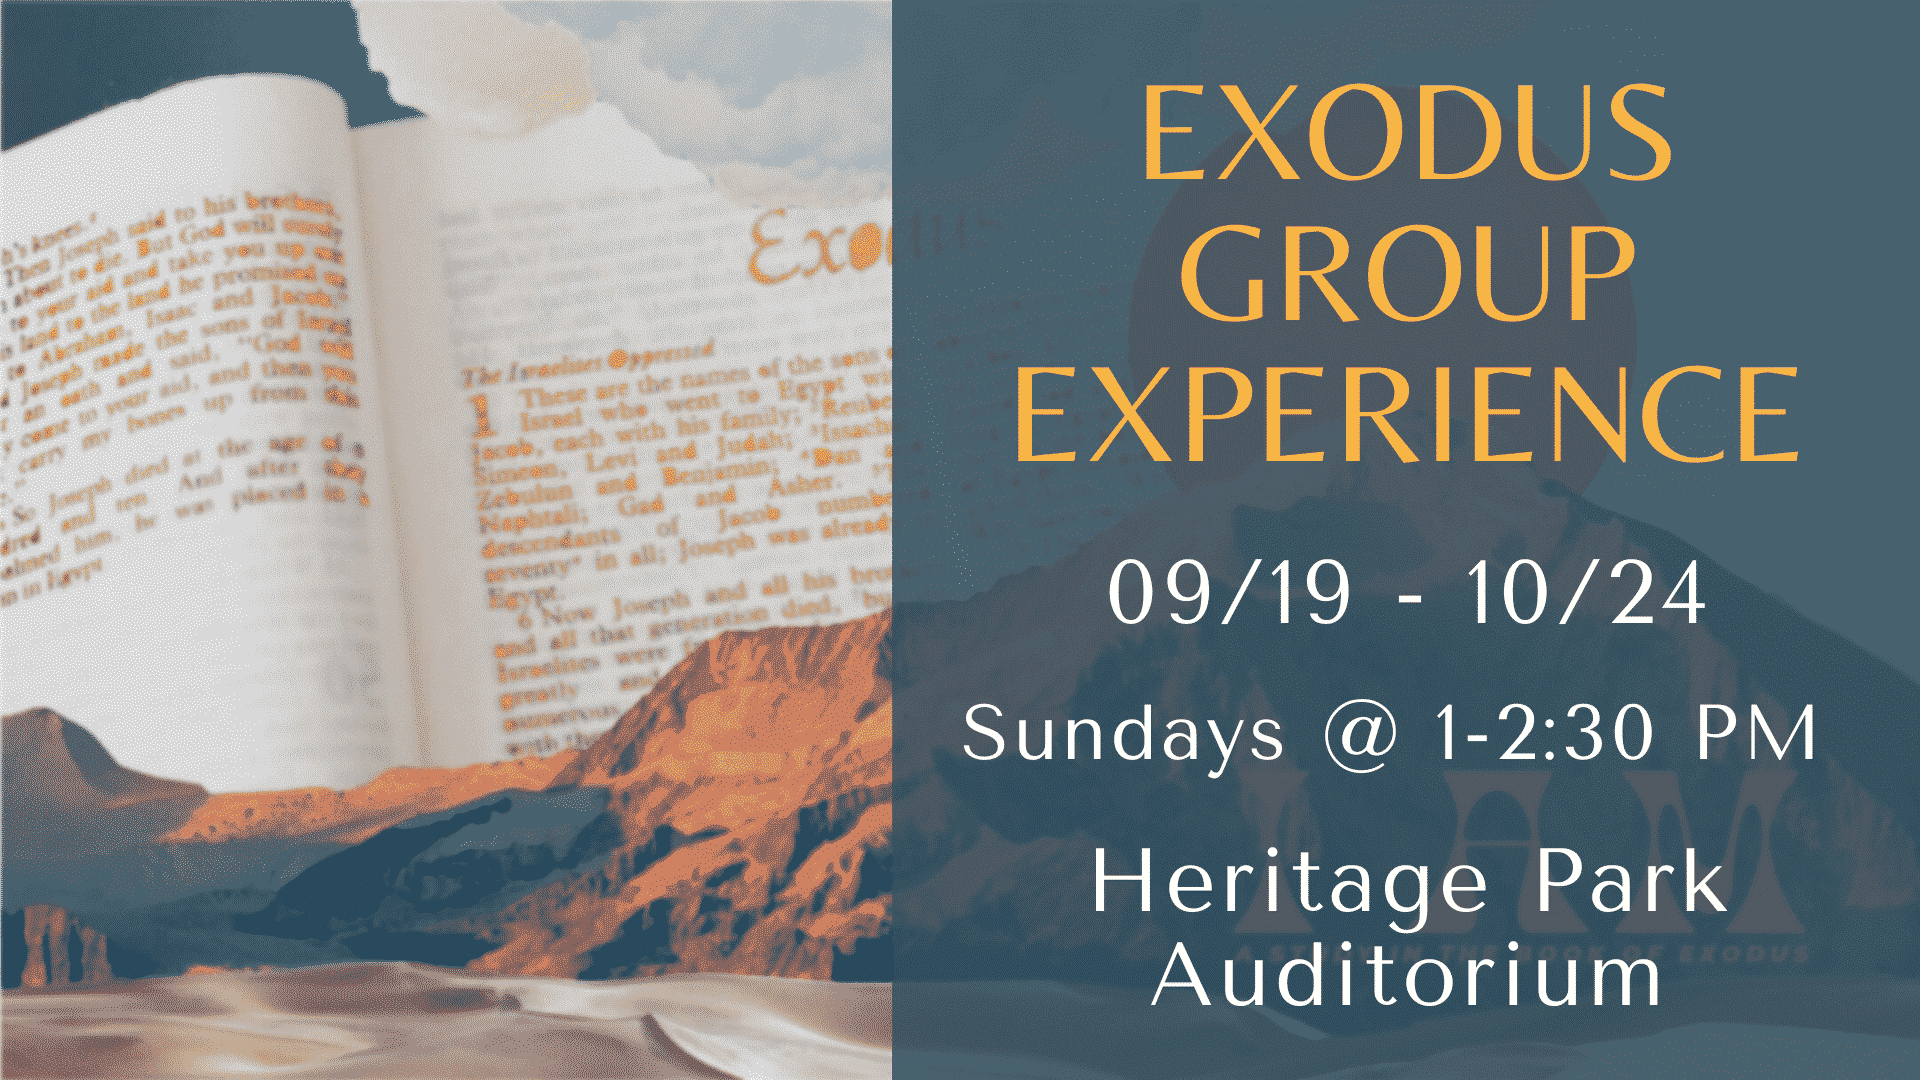 Exodus Group